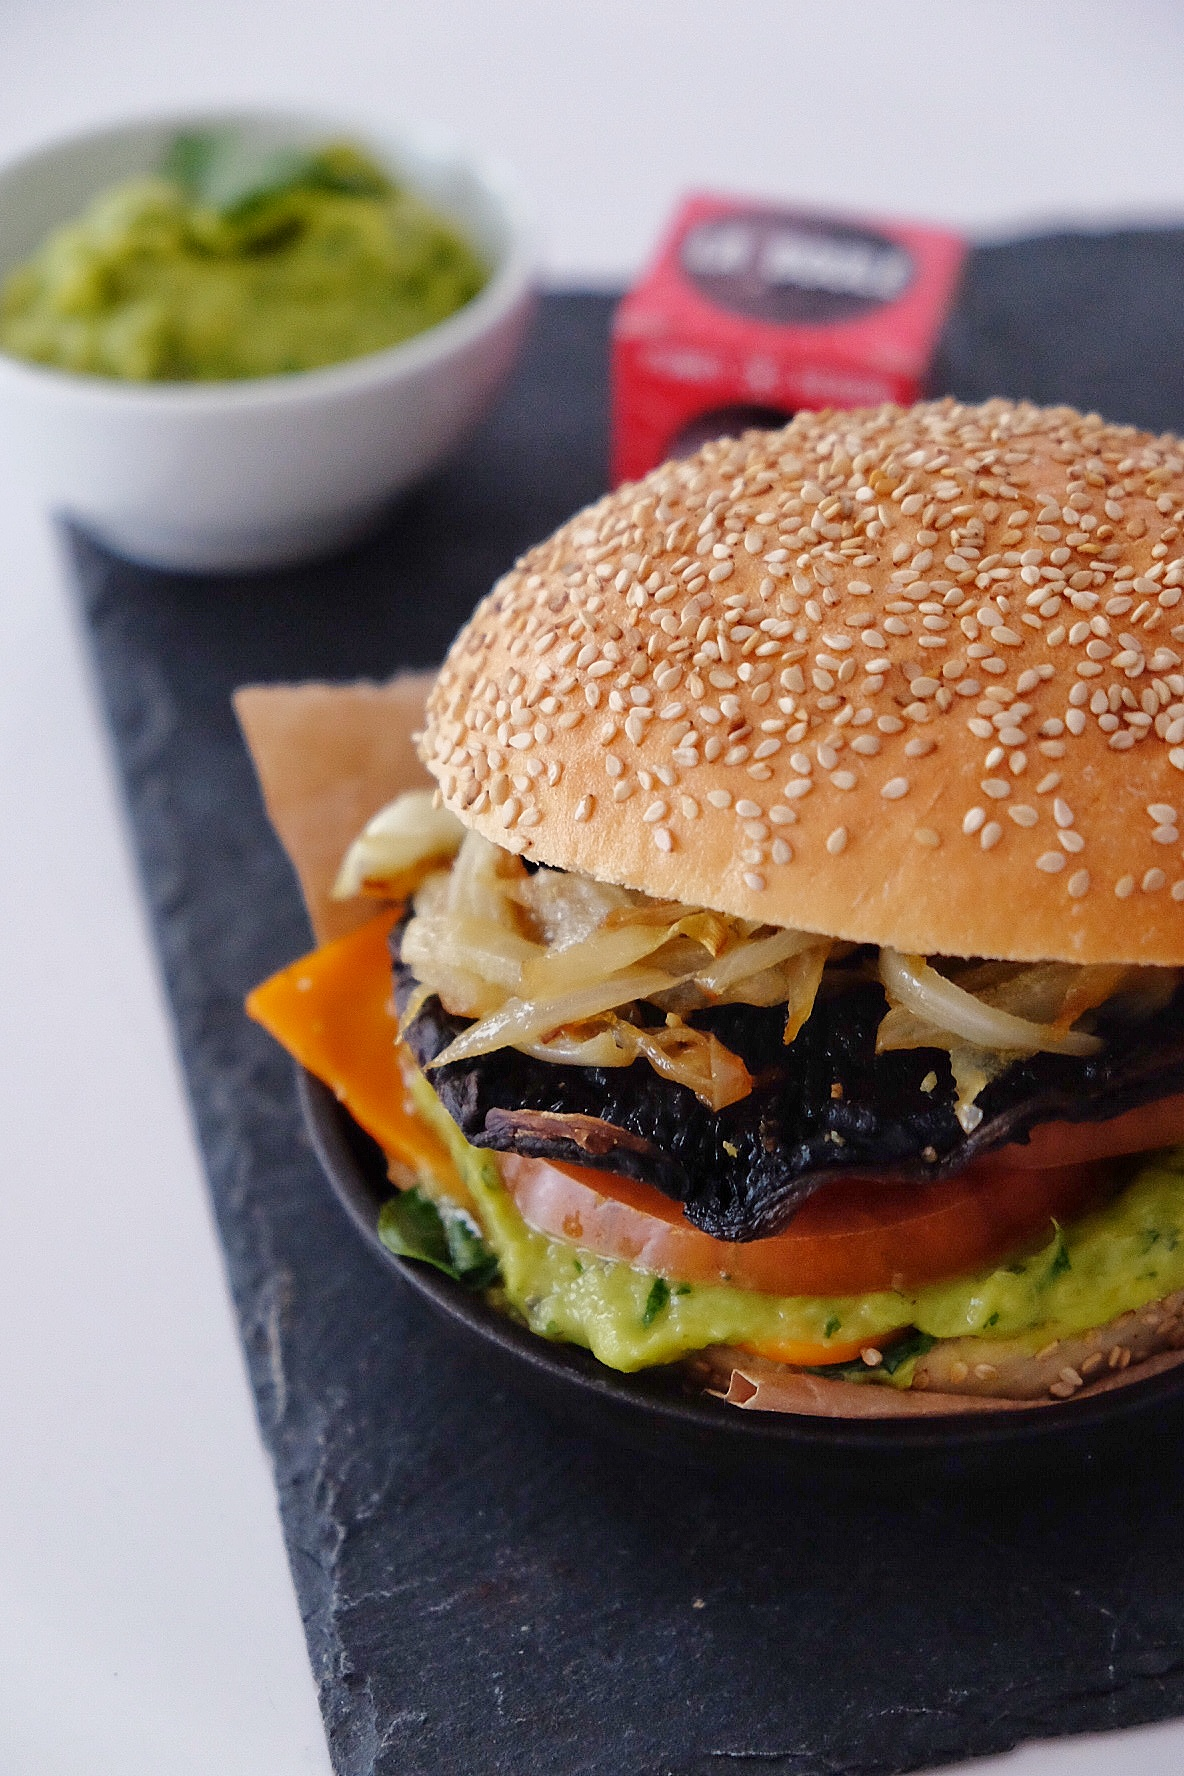 Vegetarian burger with Portobello mushrooms